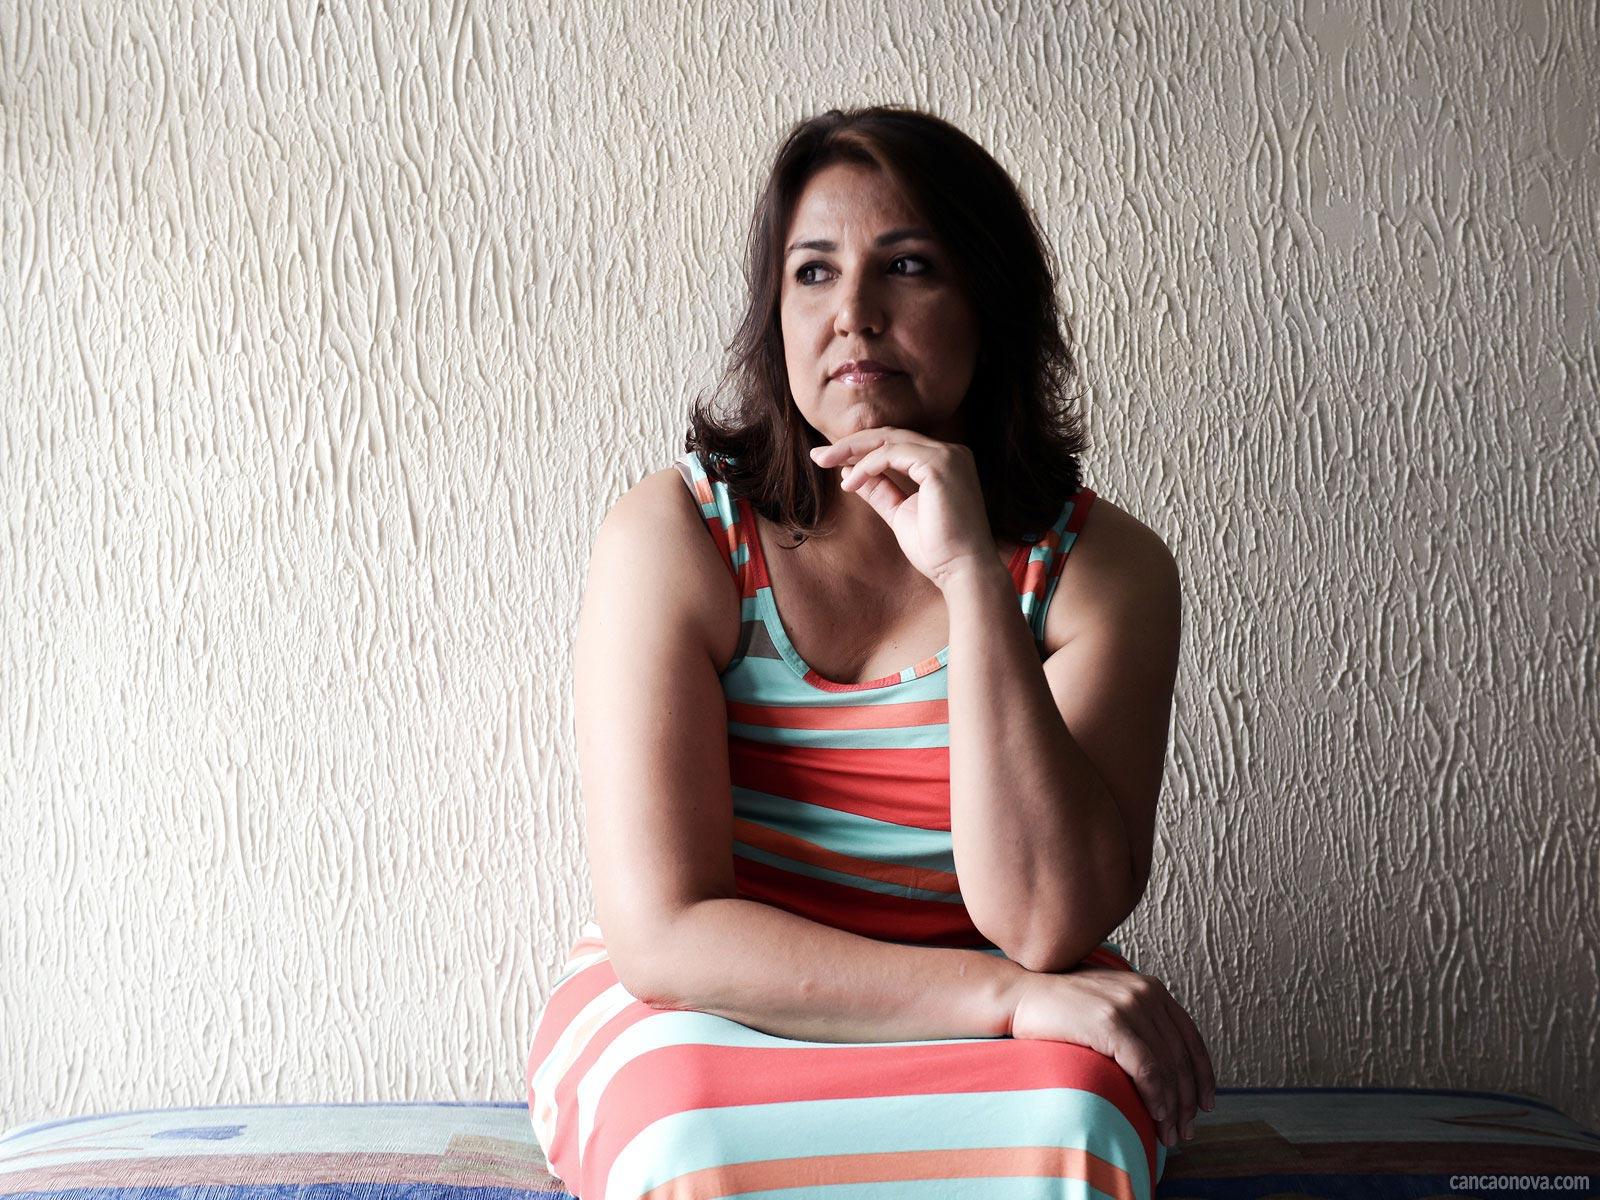 Célia Barros testemunha como foi viver o tratamento do câncer de mama (2)